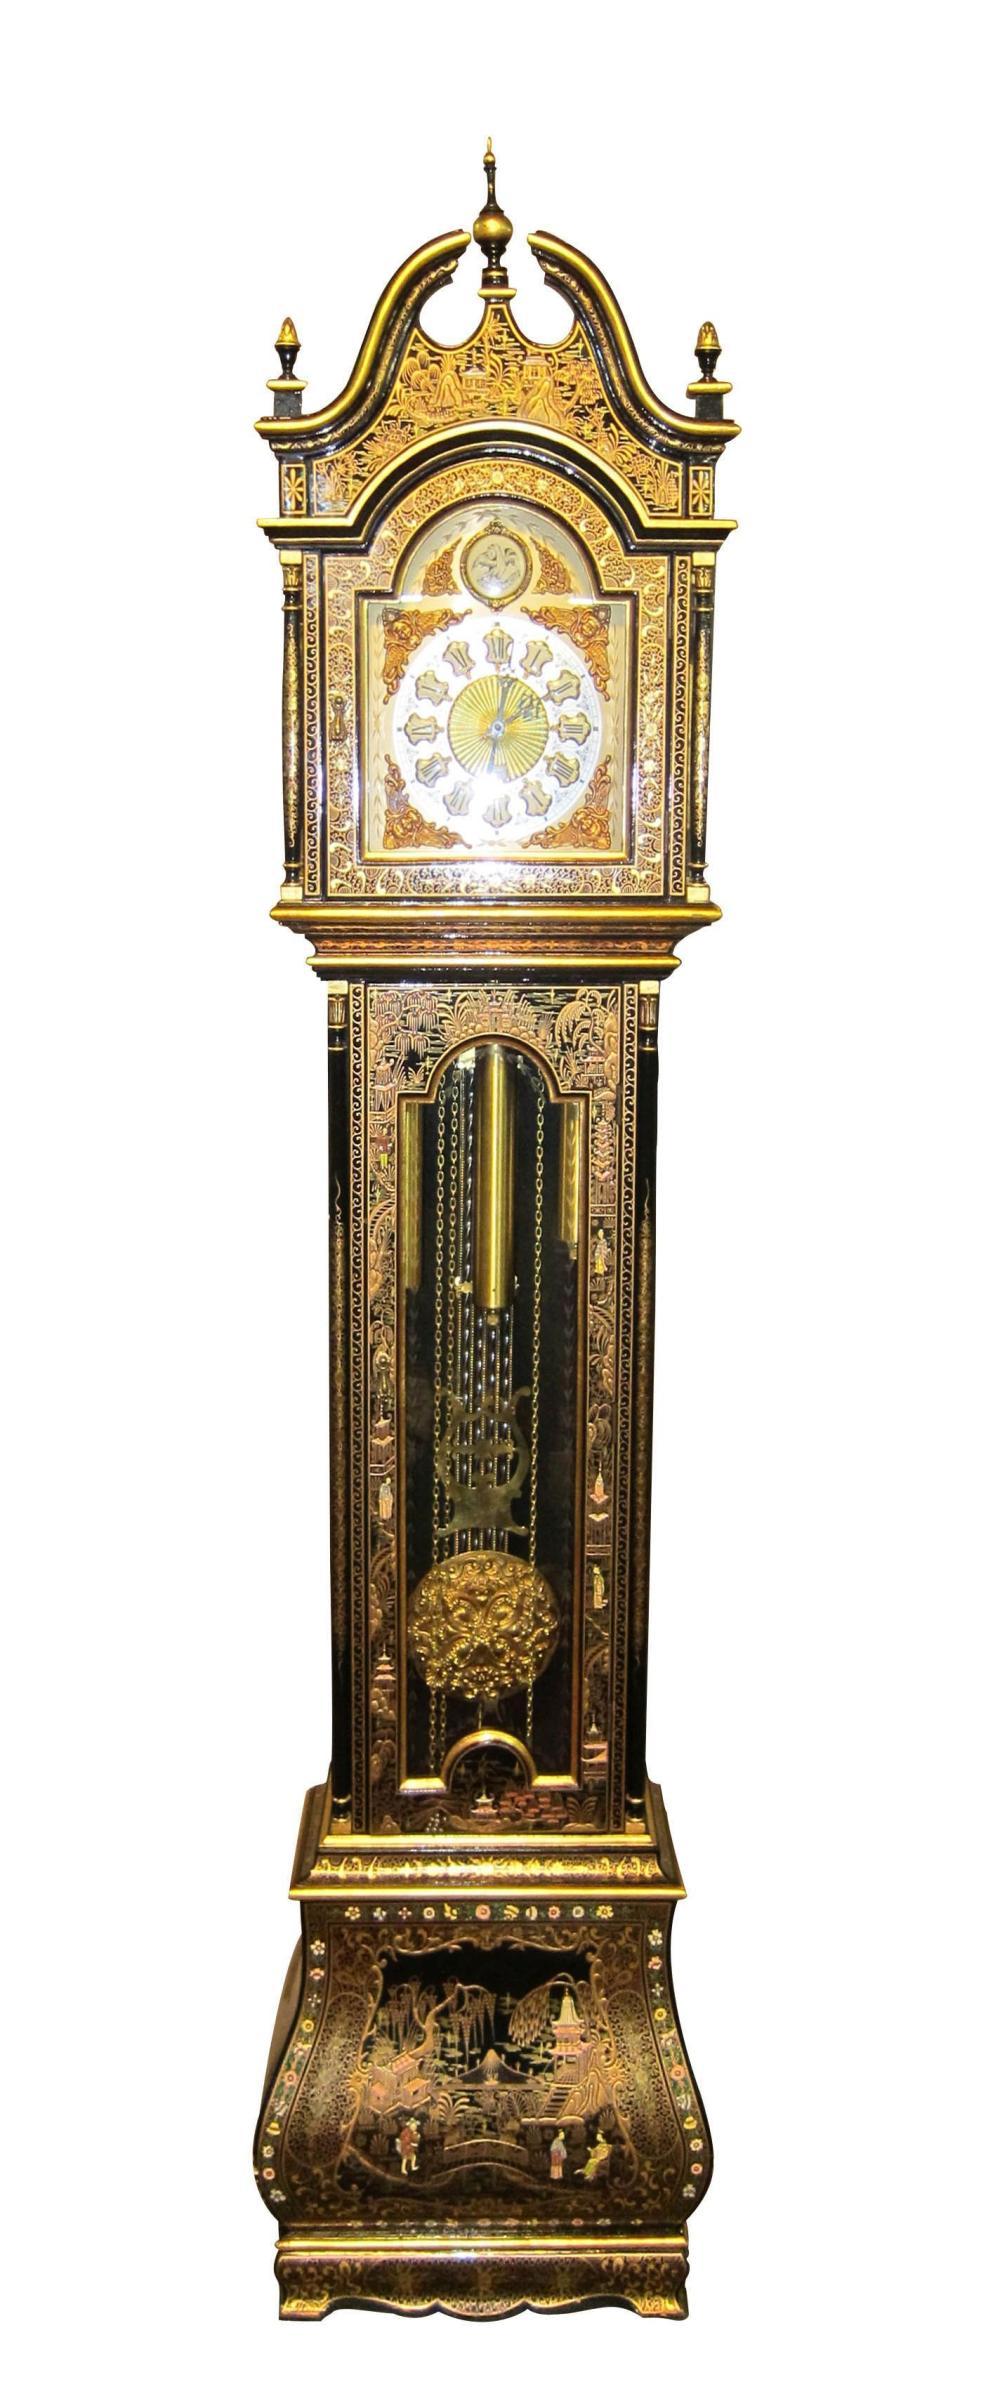 Chinese grandfather clock